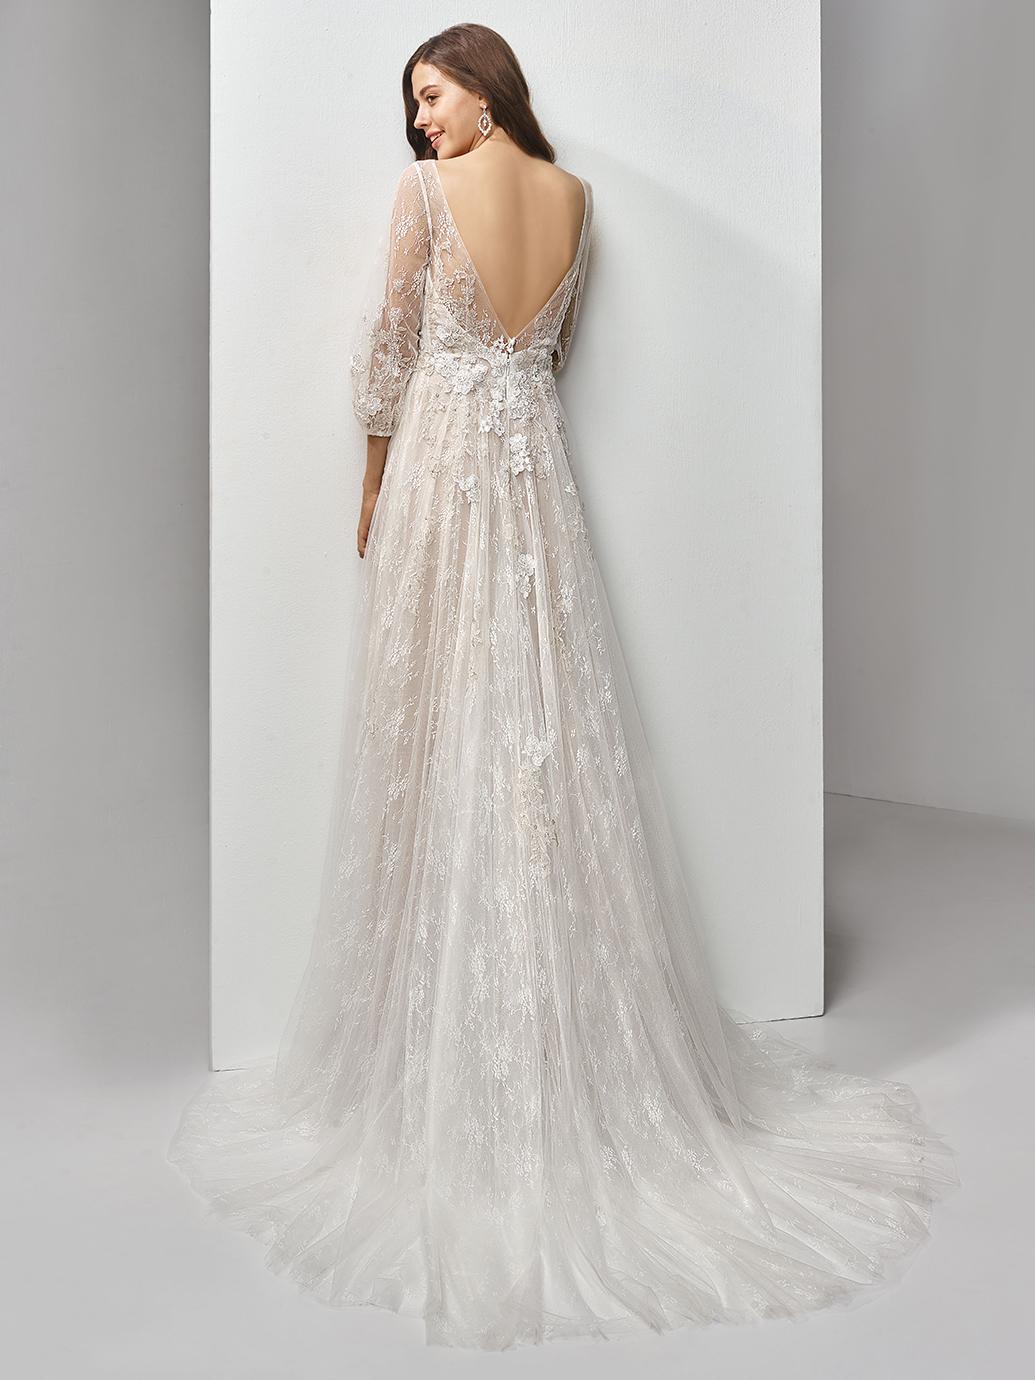 Enzoani Wedding Dress BT19-18 Aline wedding dress long sleeve wedding dress boho wedding dress backless wedding dress